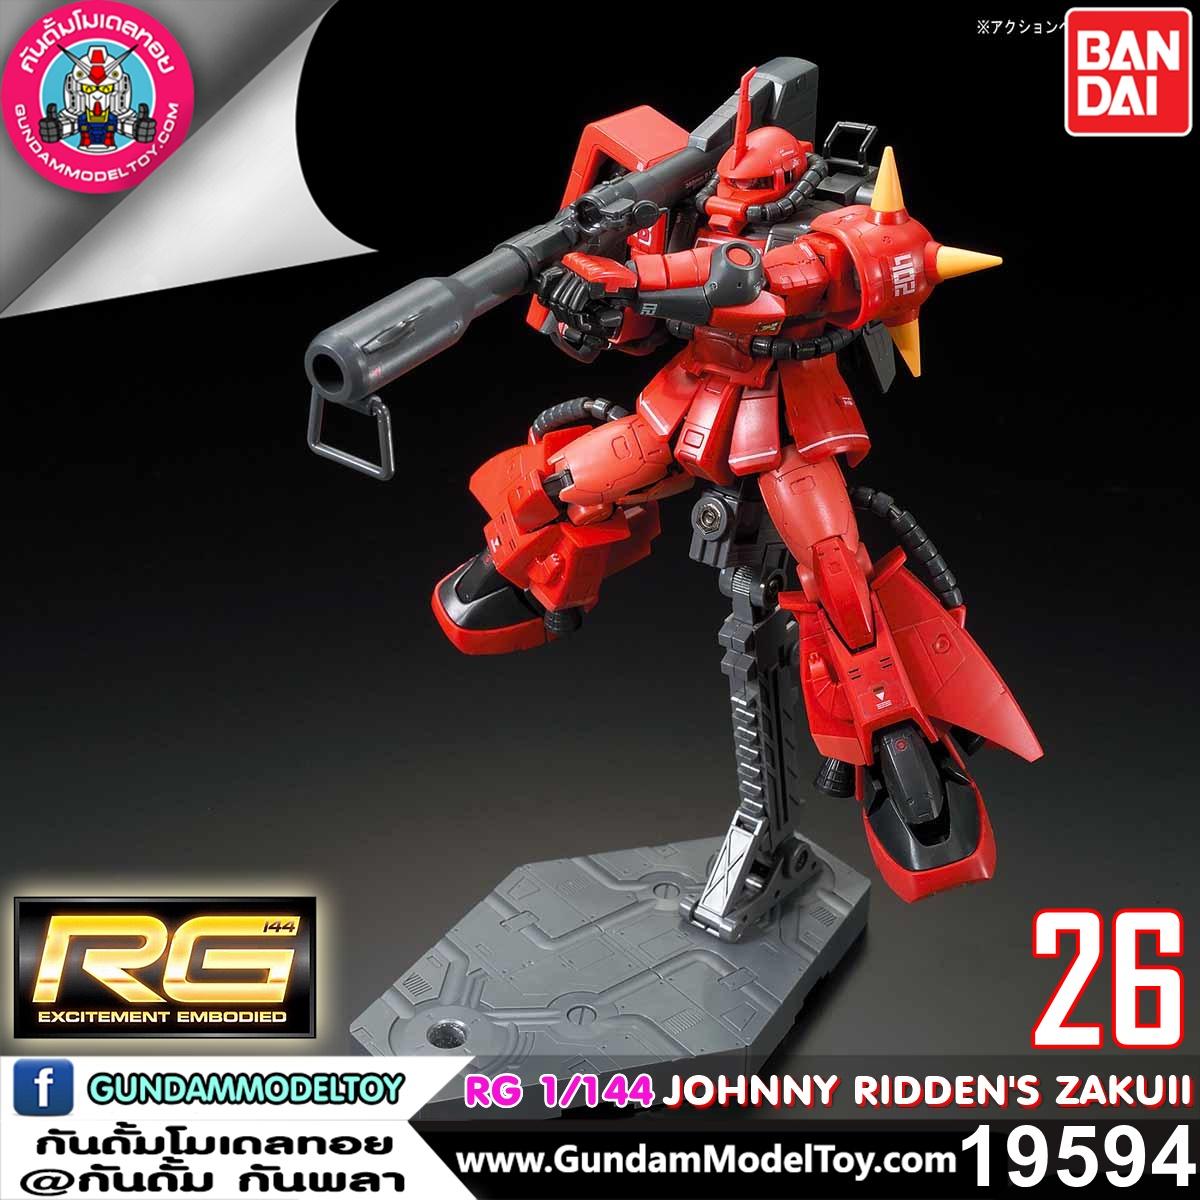 RG 1/144 JOHNNY RIDDEN'S ZAKU II